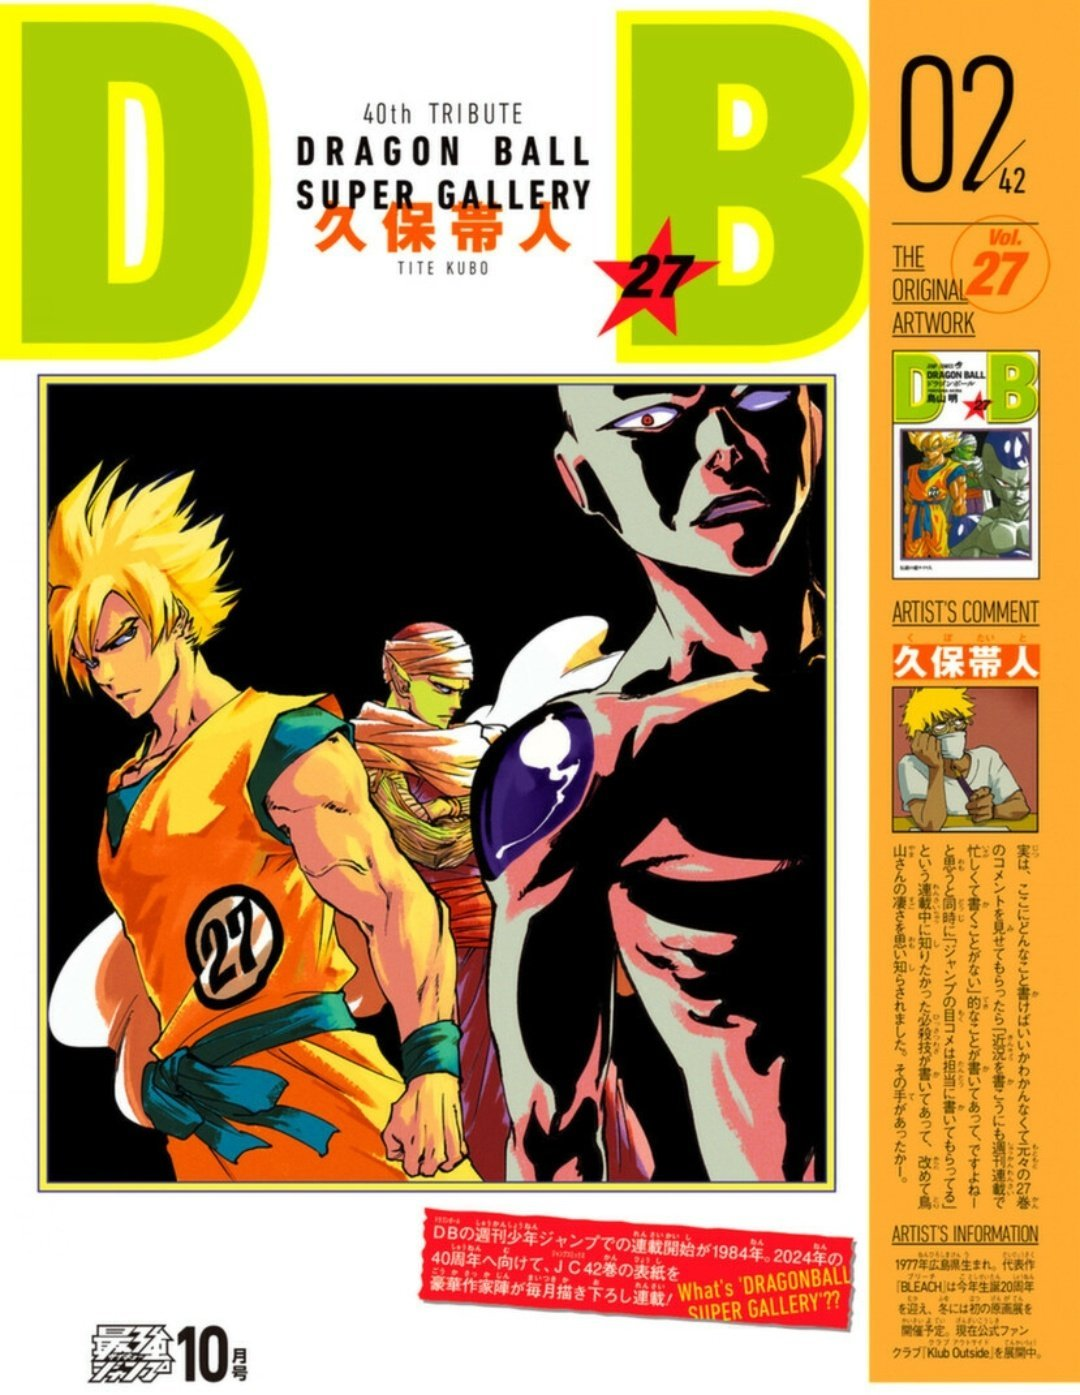 DRAGON BALL SUPER GALLERY Tite Kubo (Bleach) volume 27